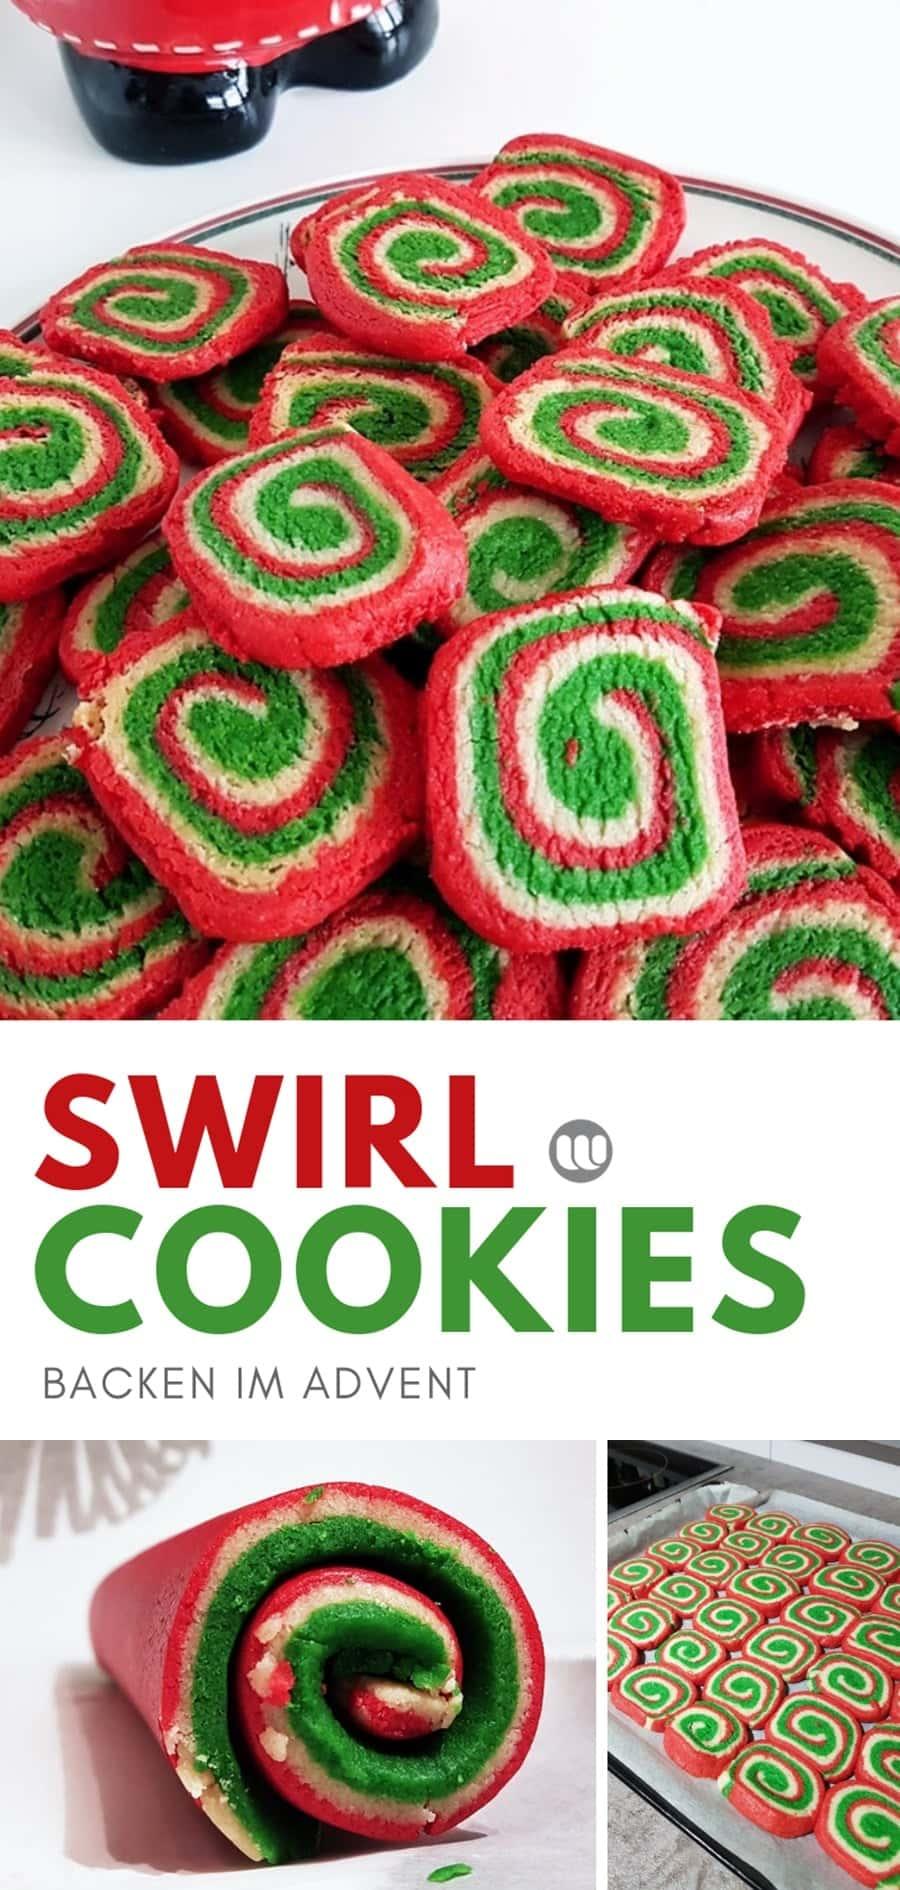 Swirl Kekse selber backen: Bunte Swirl-Cookie Rezept zu Weihnachten